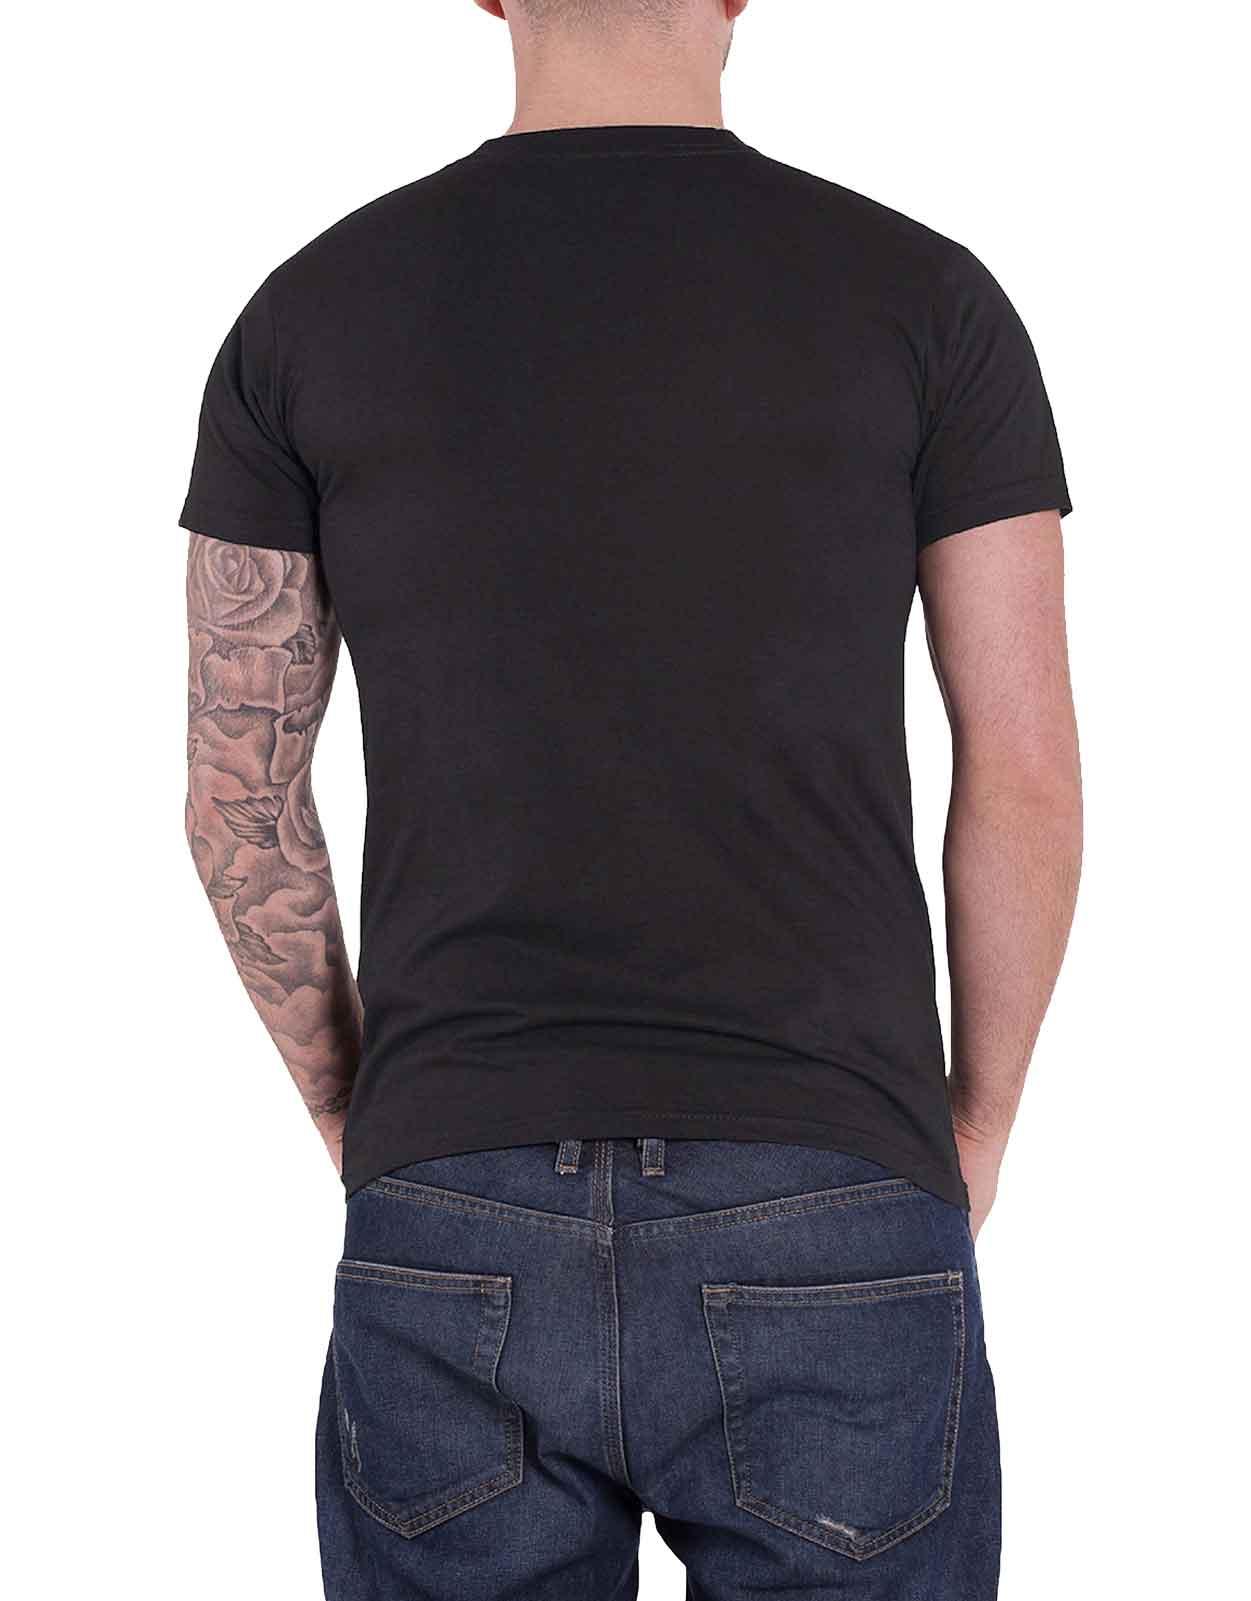 Official-Motley-Crue-T-Shirt-Shout-at-the-Devil-The-Dirt-Tour-Band-Logo-Mens thumbnail 23